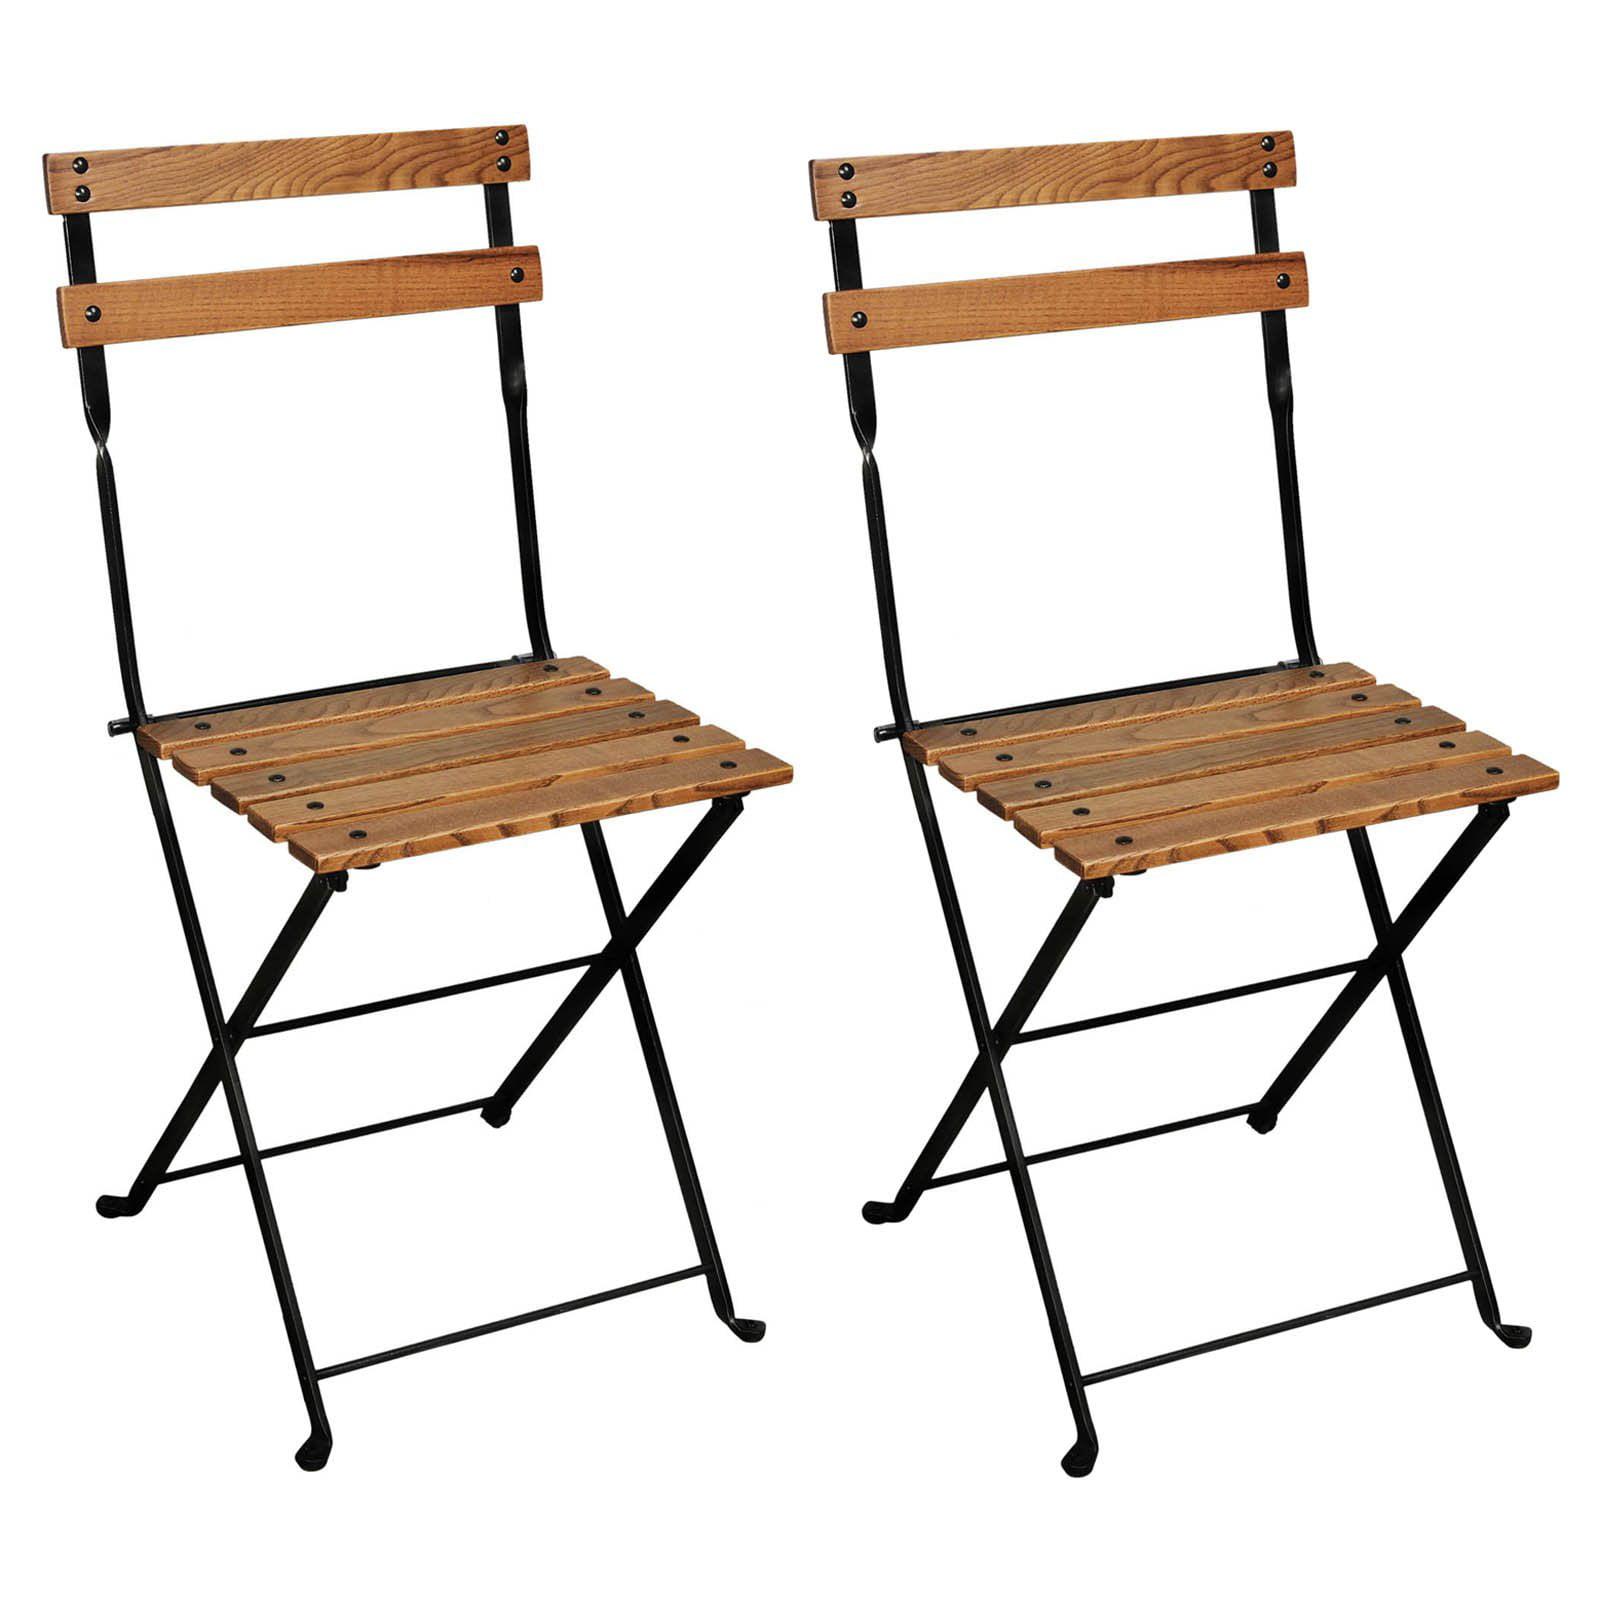 Furniture Designhouse French Veranda European Cafe Folding Side Chair with European Chestnut Wood Slats - Set of 2